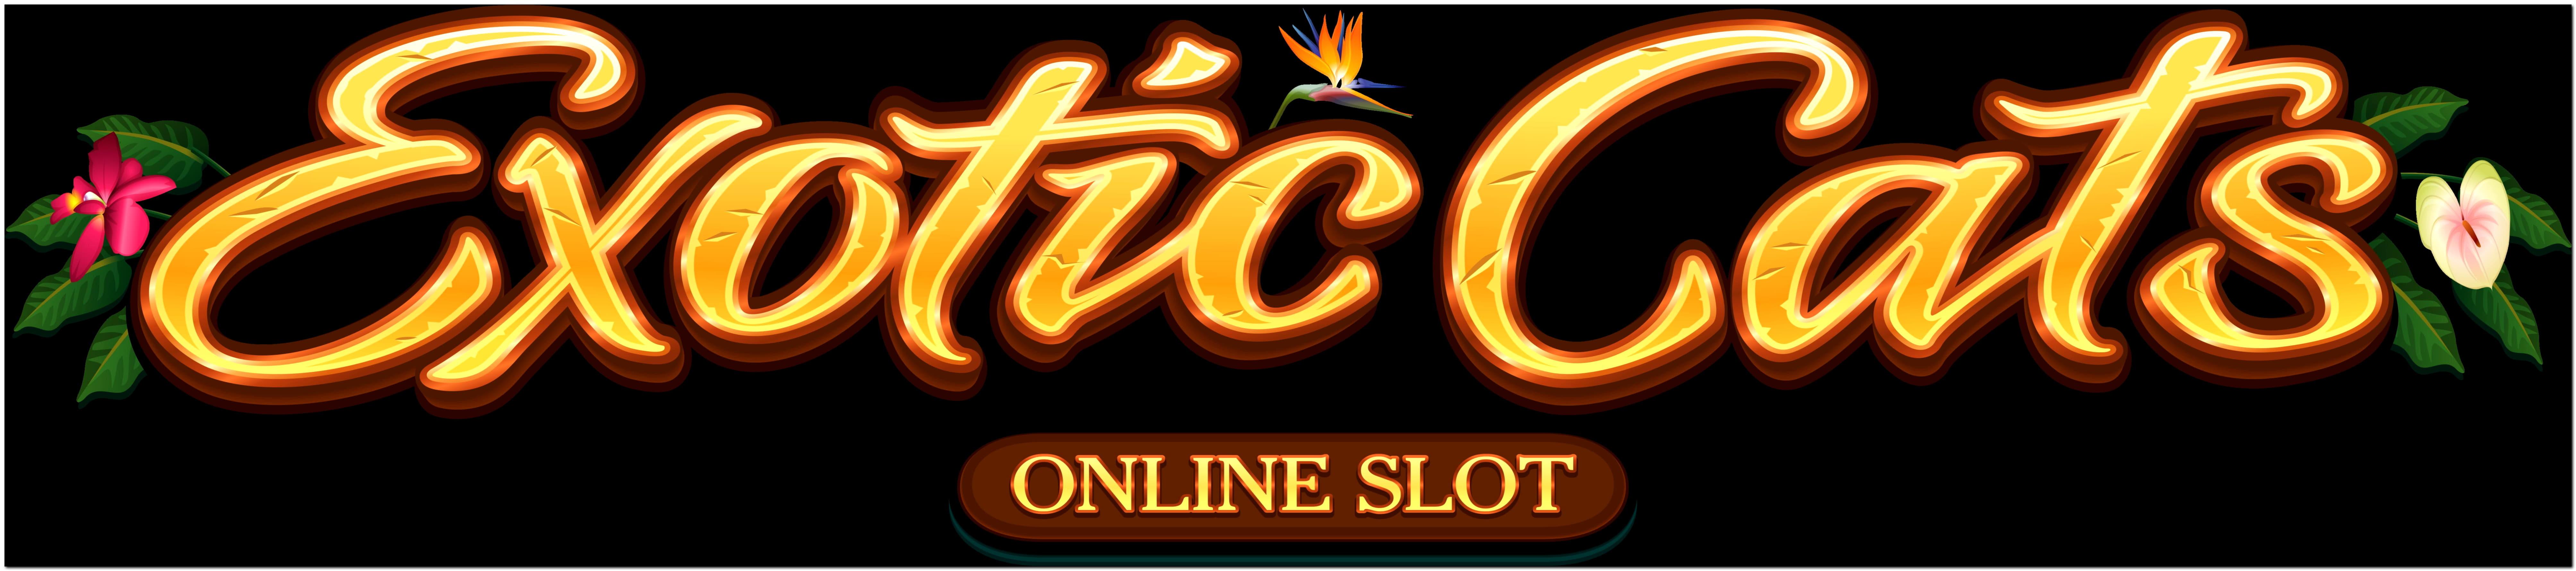 345% Welcome Bonus at Mobile Bet Casino